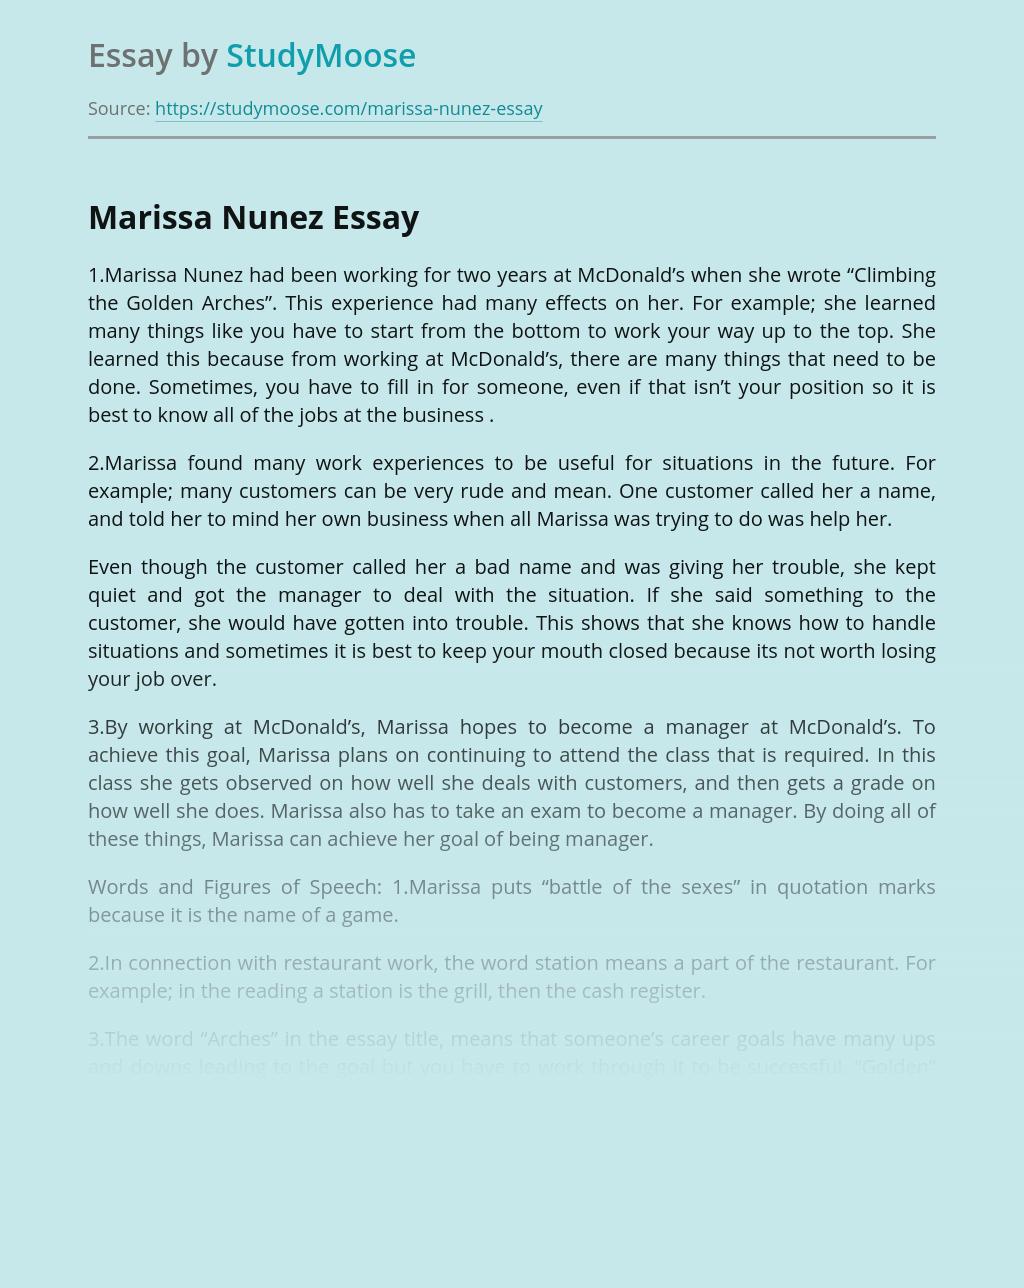 Professional Behavior of Marissa Nunez